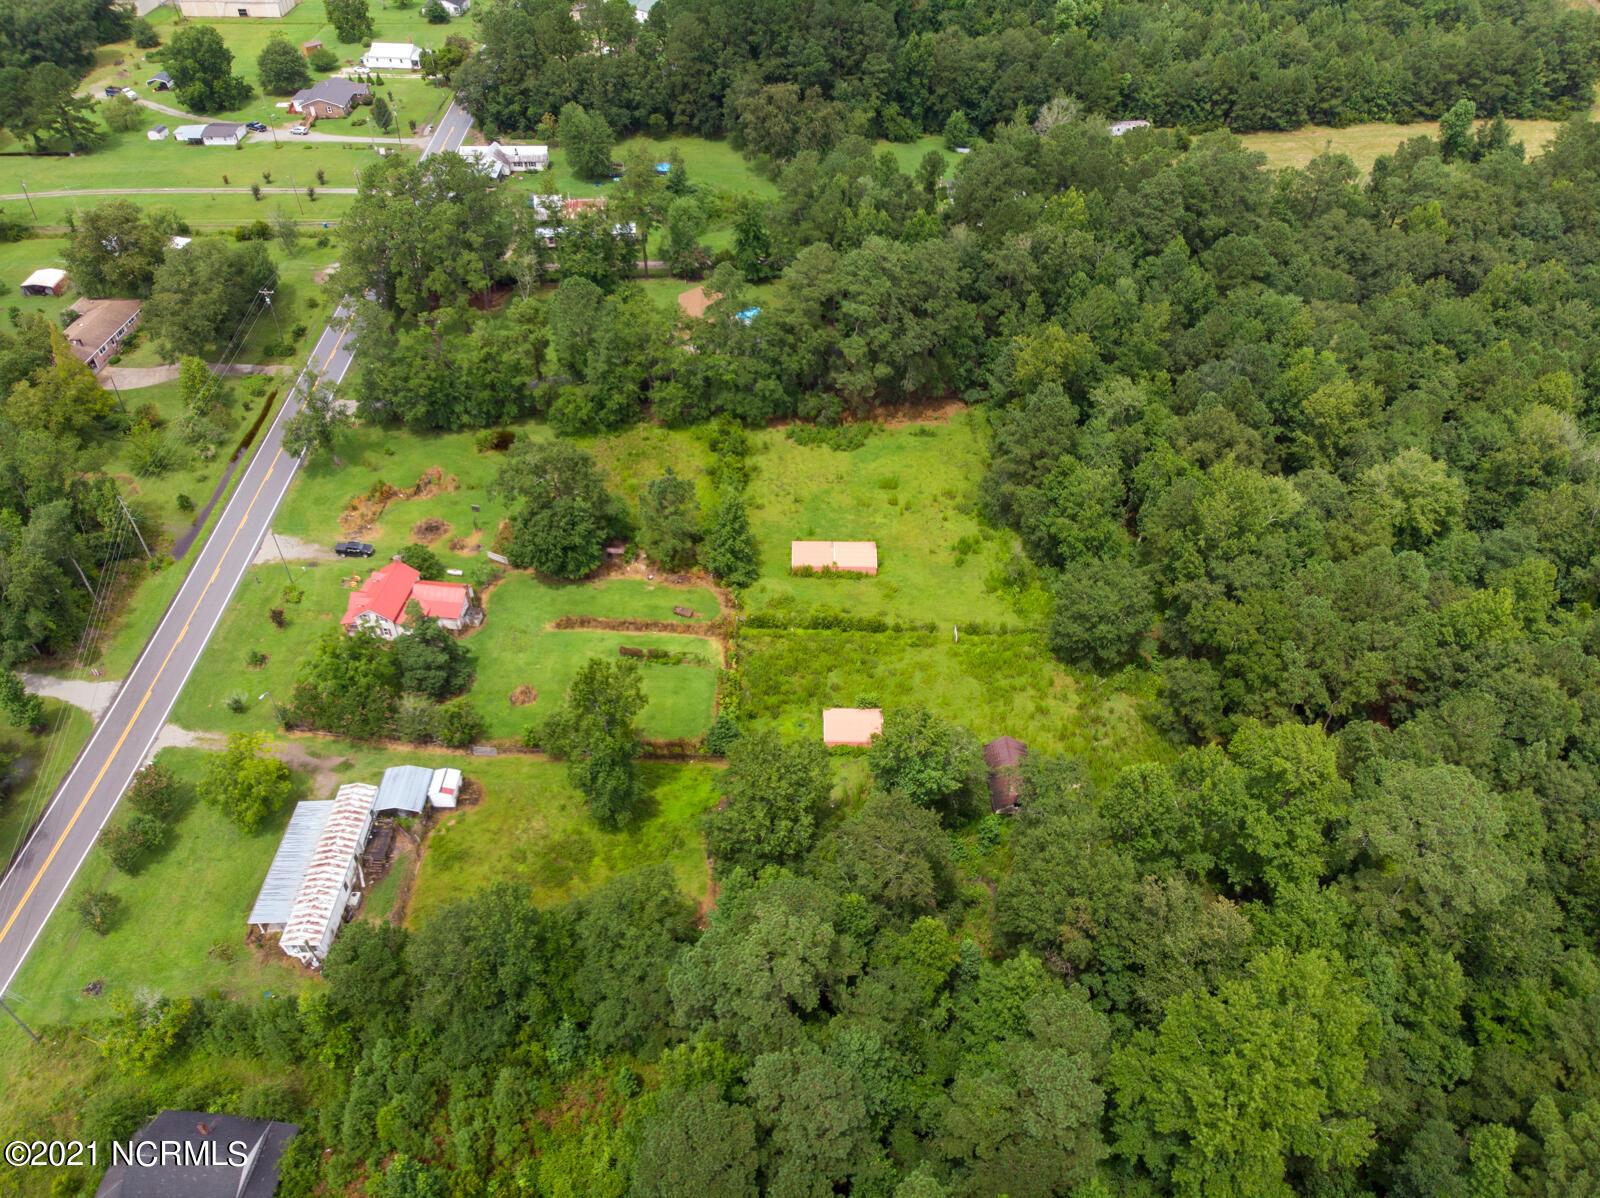 1692 Nc-306 Highway, Grantsboro, North Carolina 28529, 3 Bedrooms Bedrooms, 5 Rooms Rooms,1 BathroomBathrooms,Single family residence,For sale,Nc-306,100285100